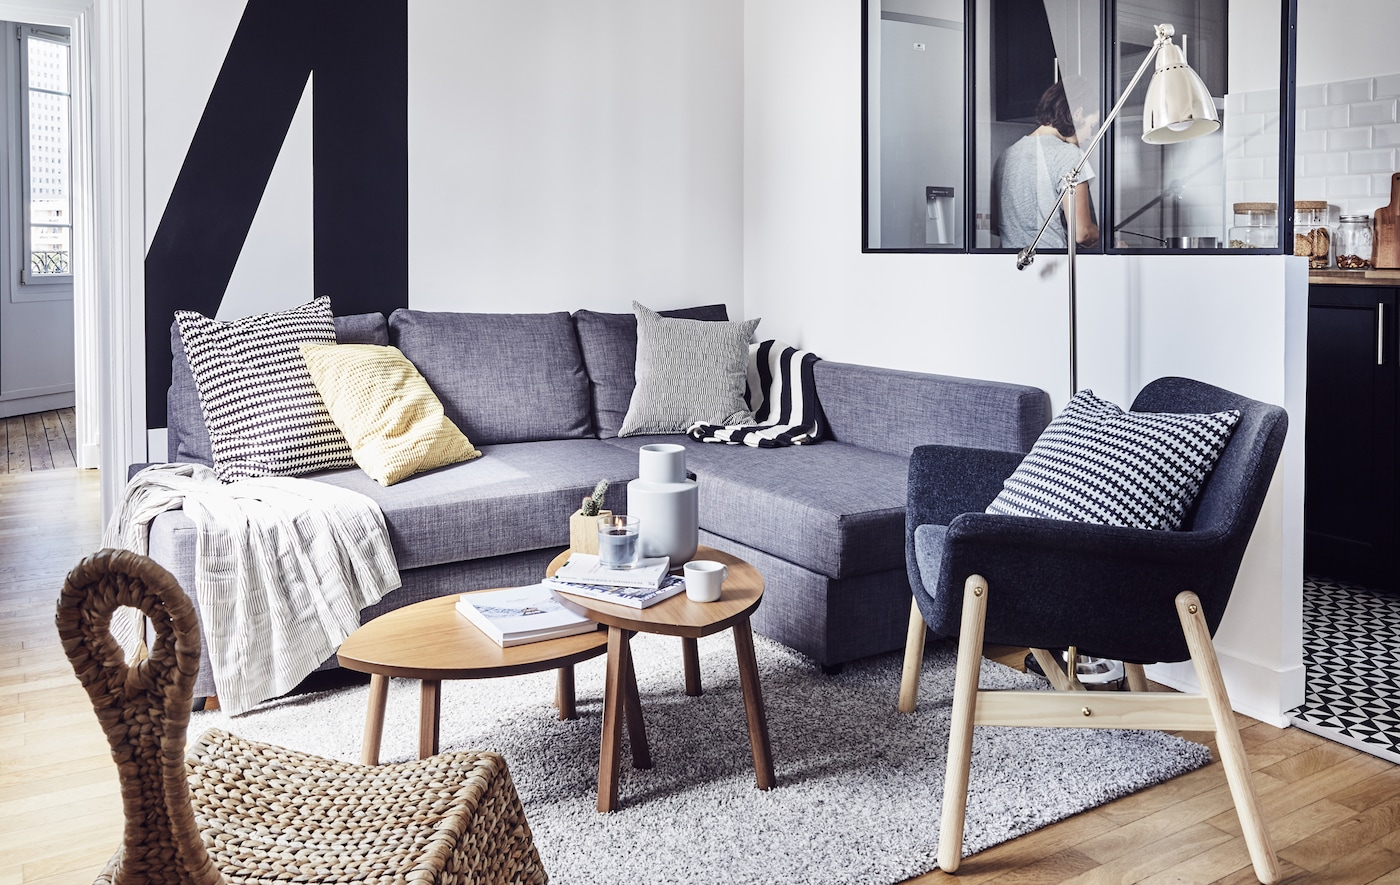 arbeits wohnzimmer kombinieren ikea ikea. Black Bedroom Furniture Sets. Home Design Ideas